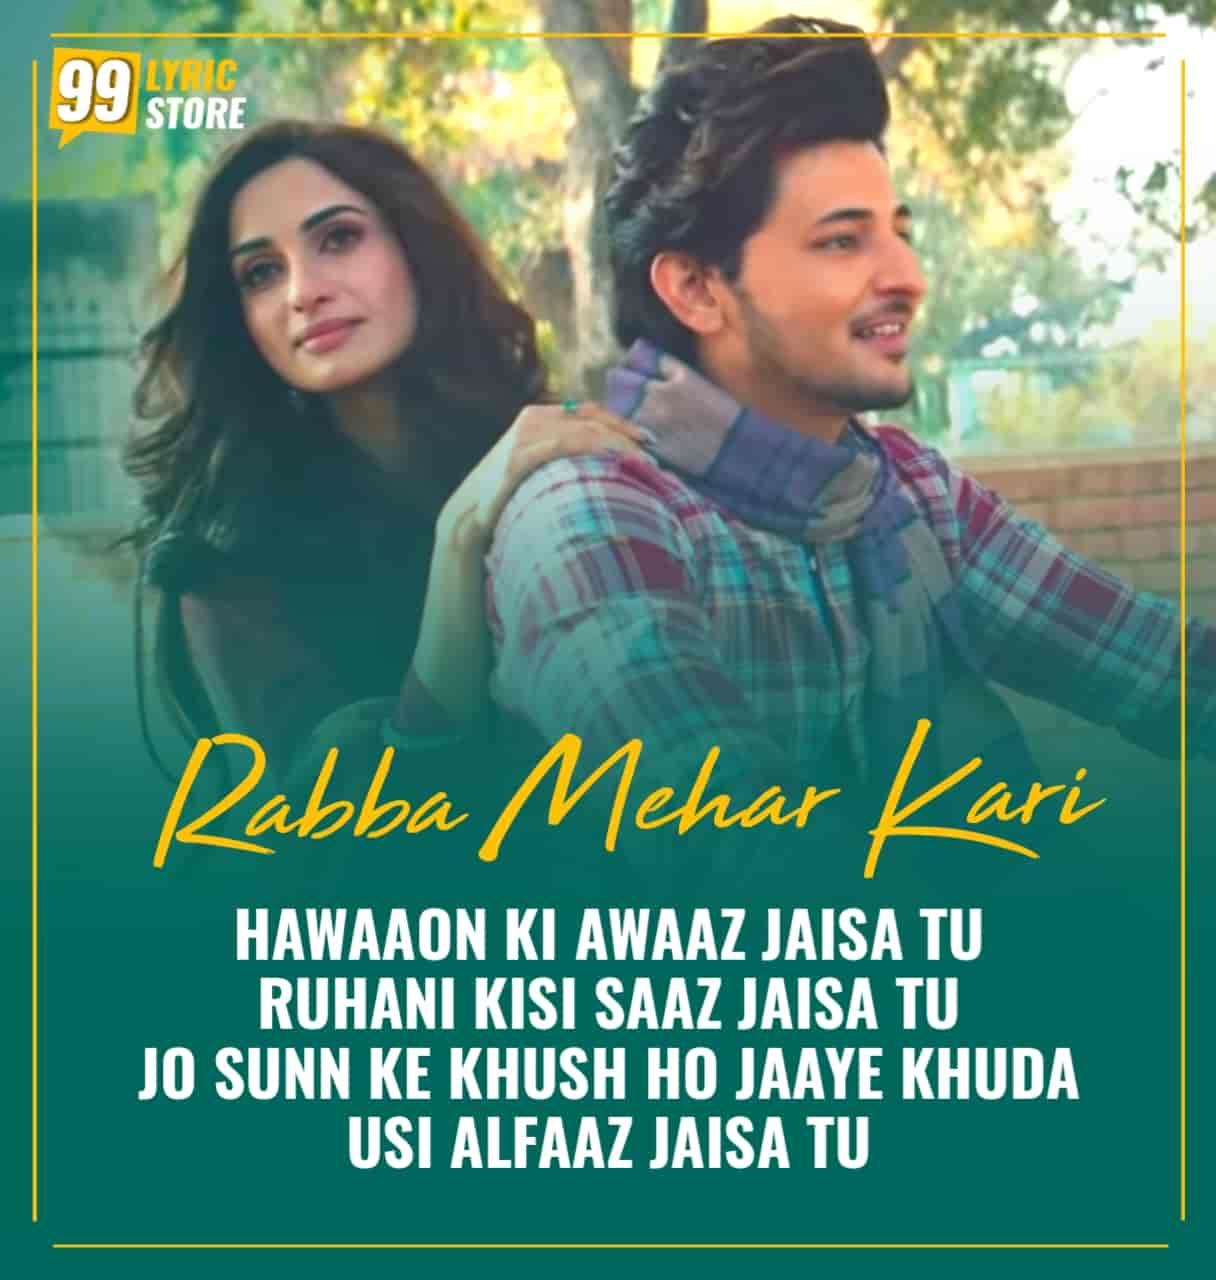 Rabba Mehar Kari Darshan Raval Song Image